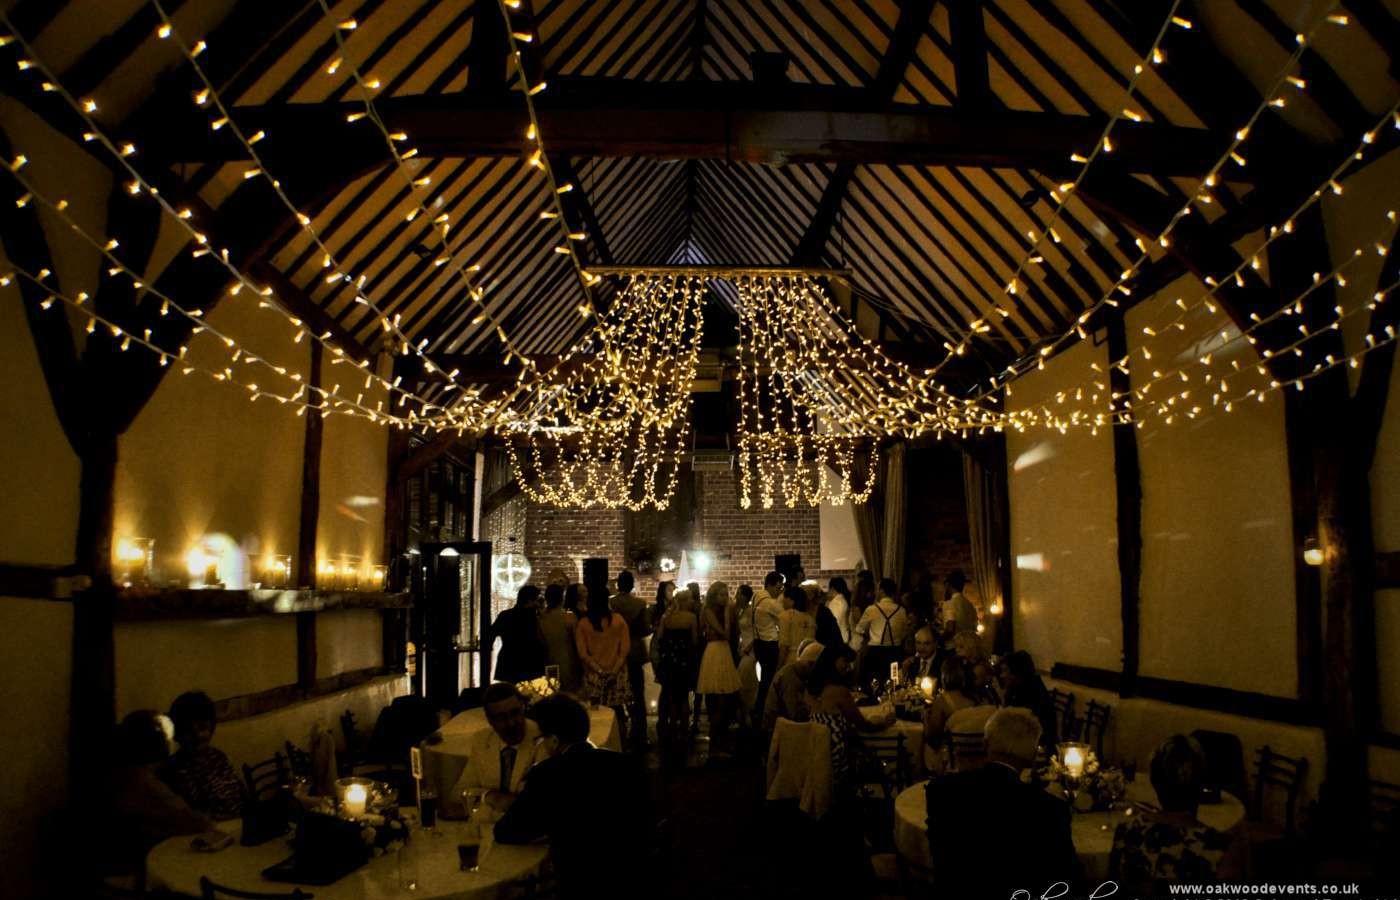 Wedding Lights Cheap 78 Led Lights 2m16m Heart Shape